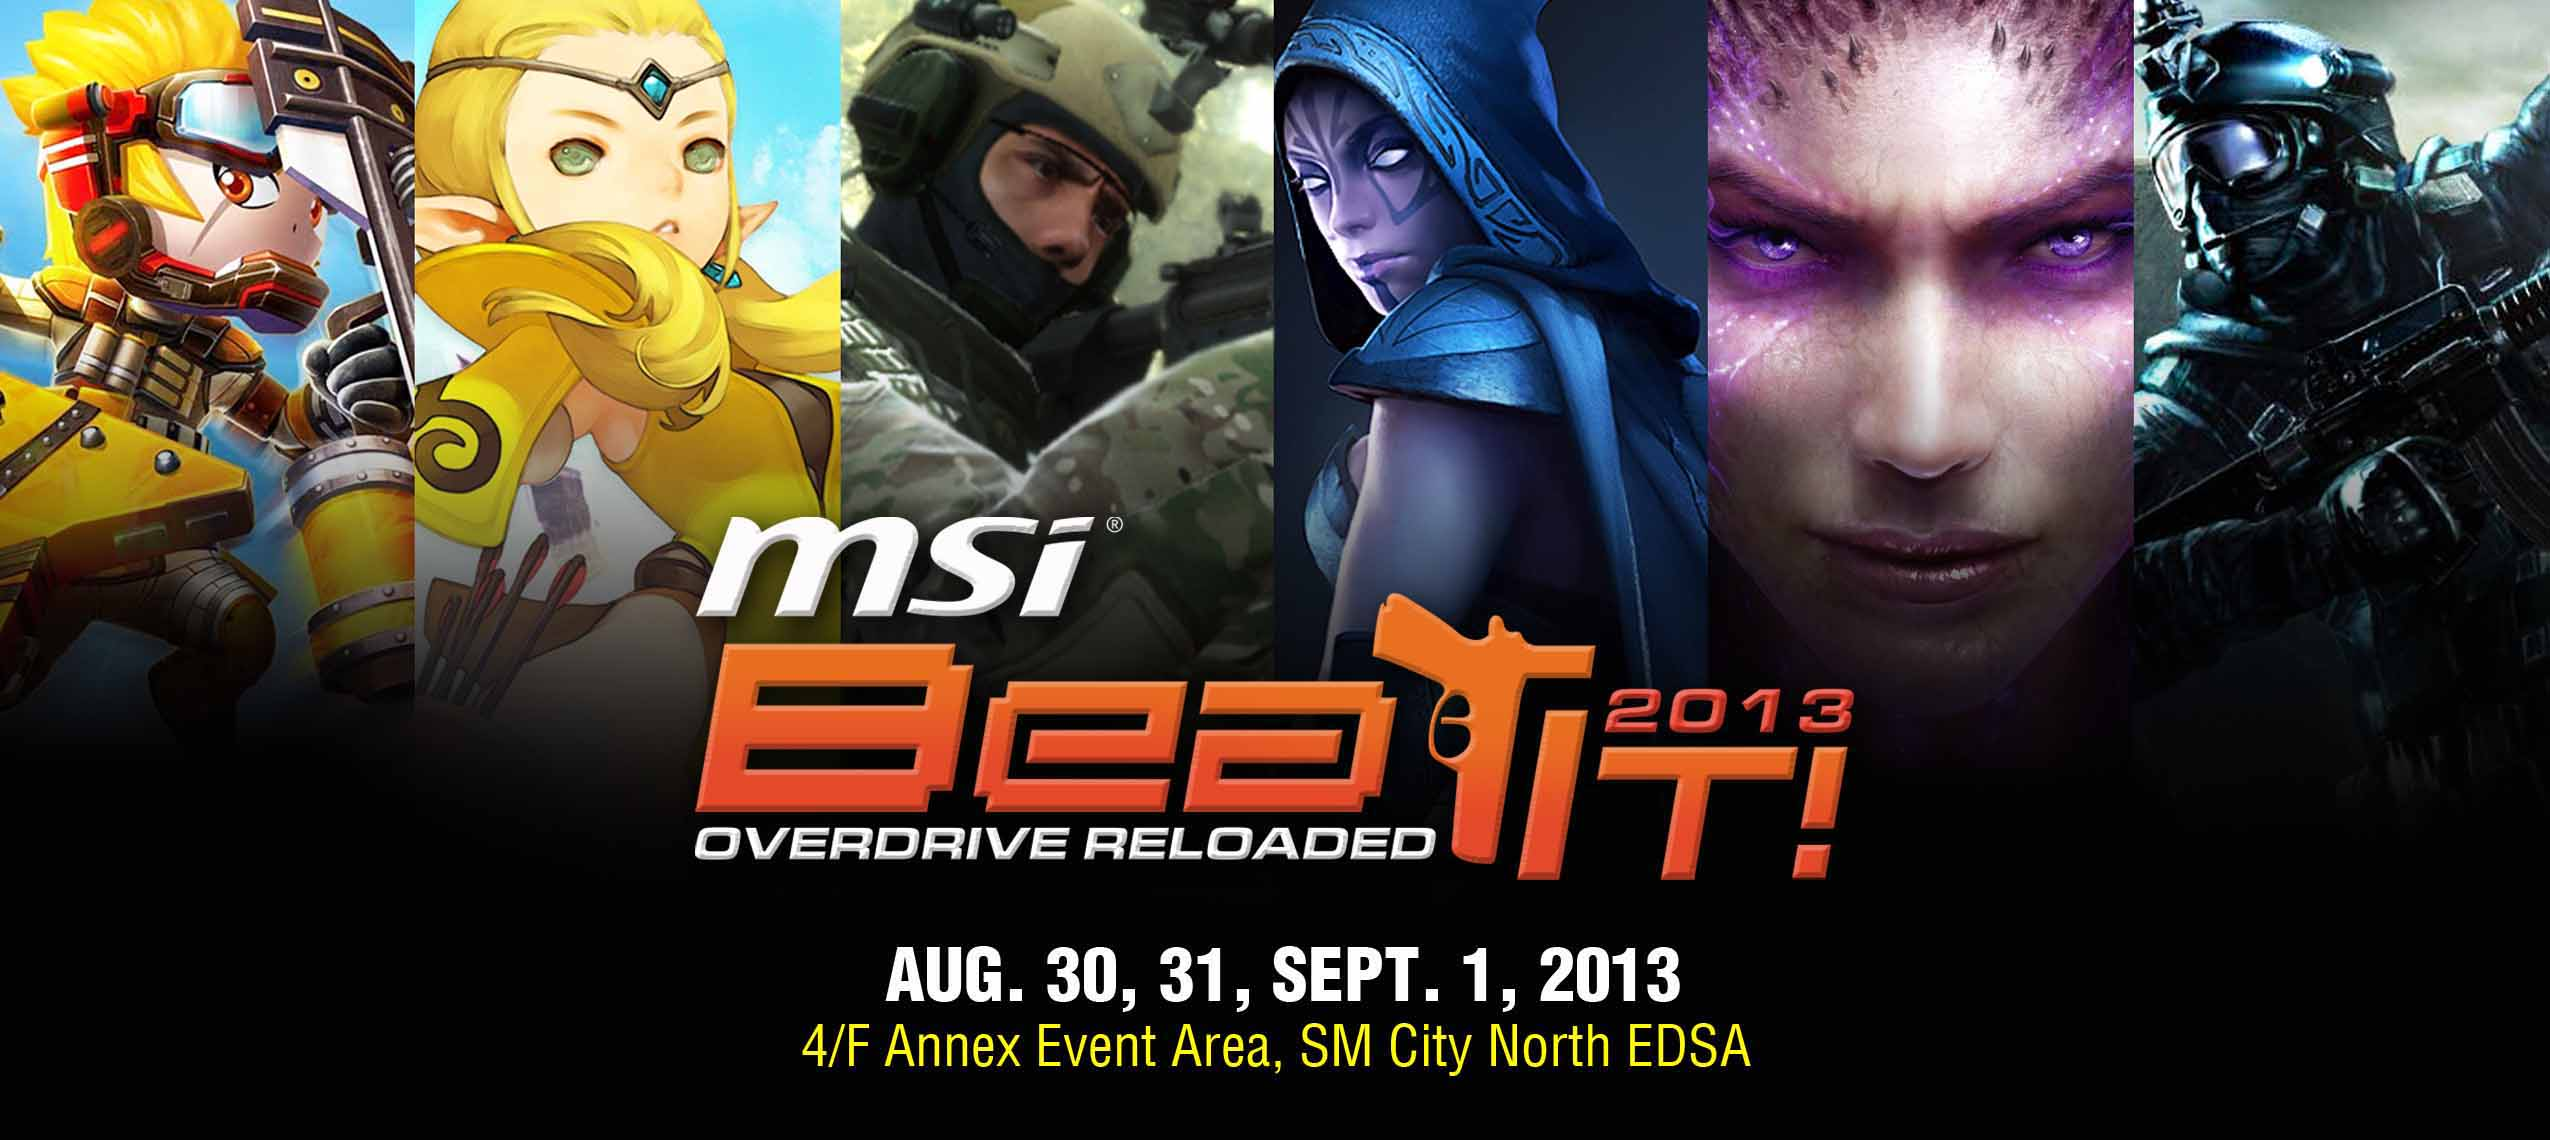 MSI-Beat-It-2013-Posters-6